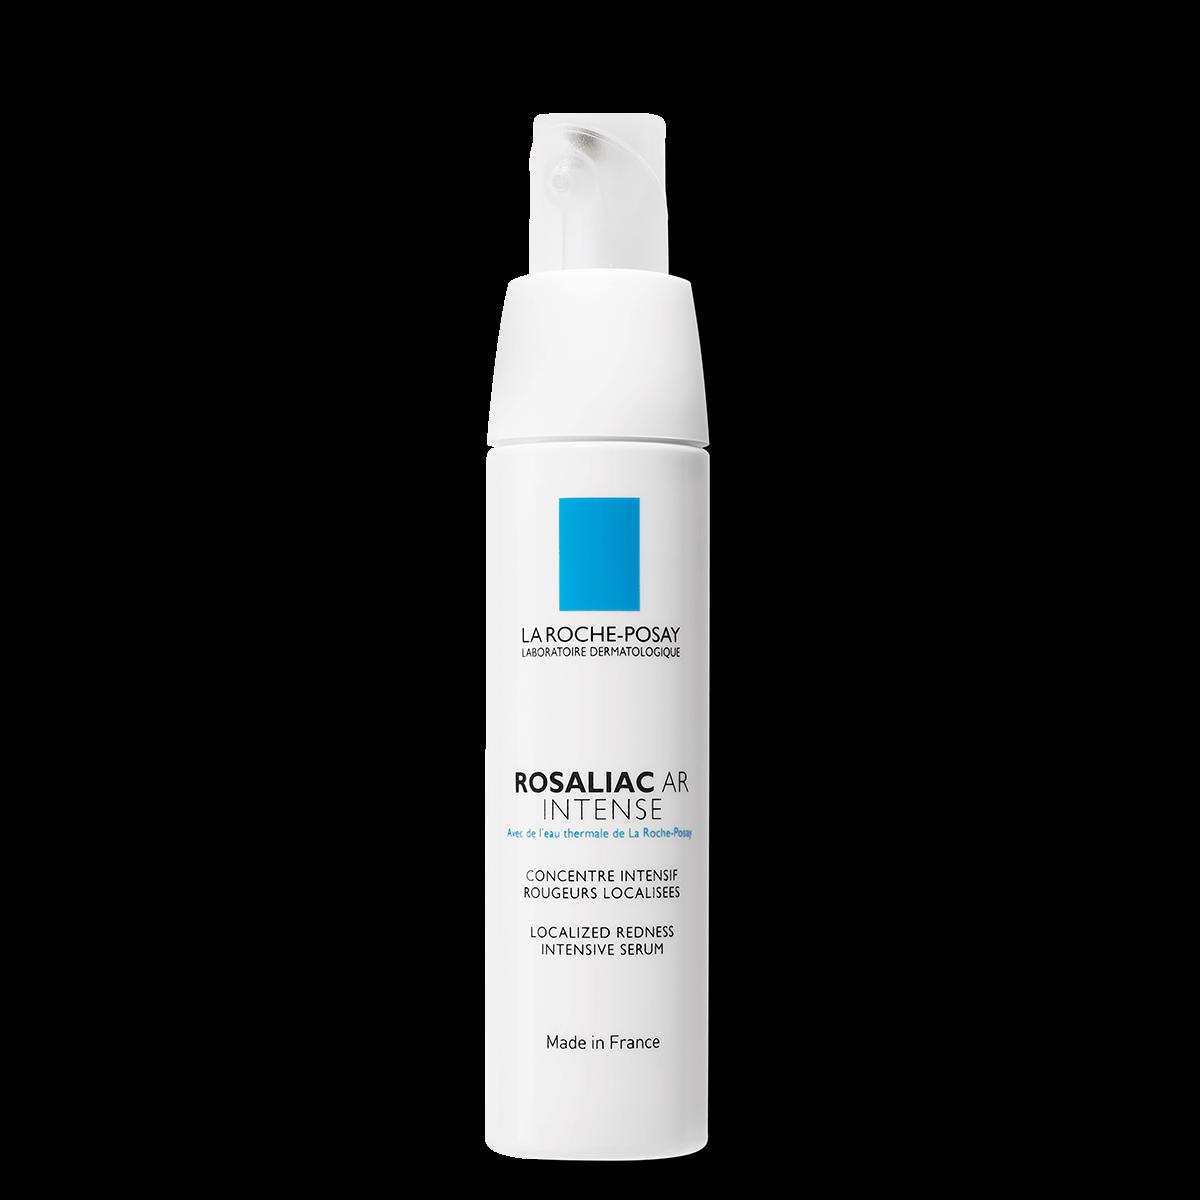 La Roche Posay ProduktSide Ansiktspleie Rosaliac AR Intense 40ml 33378724